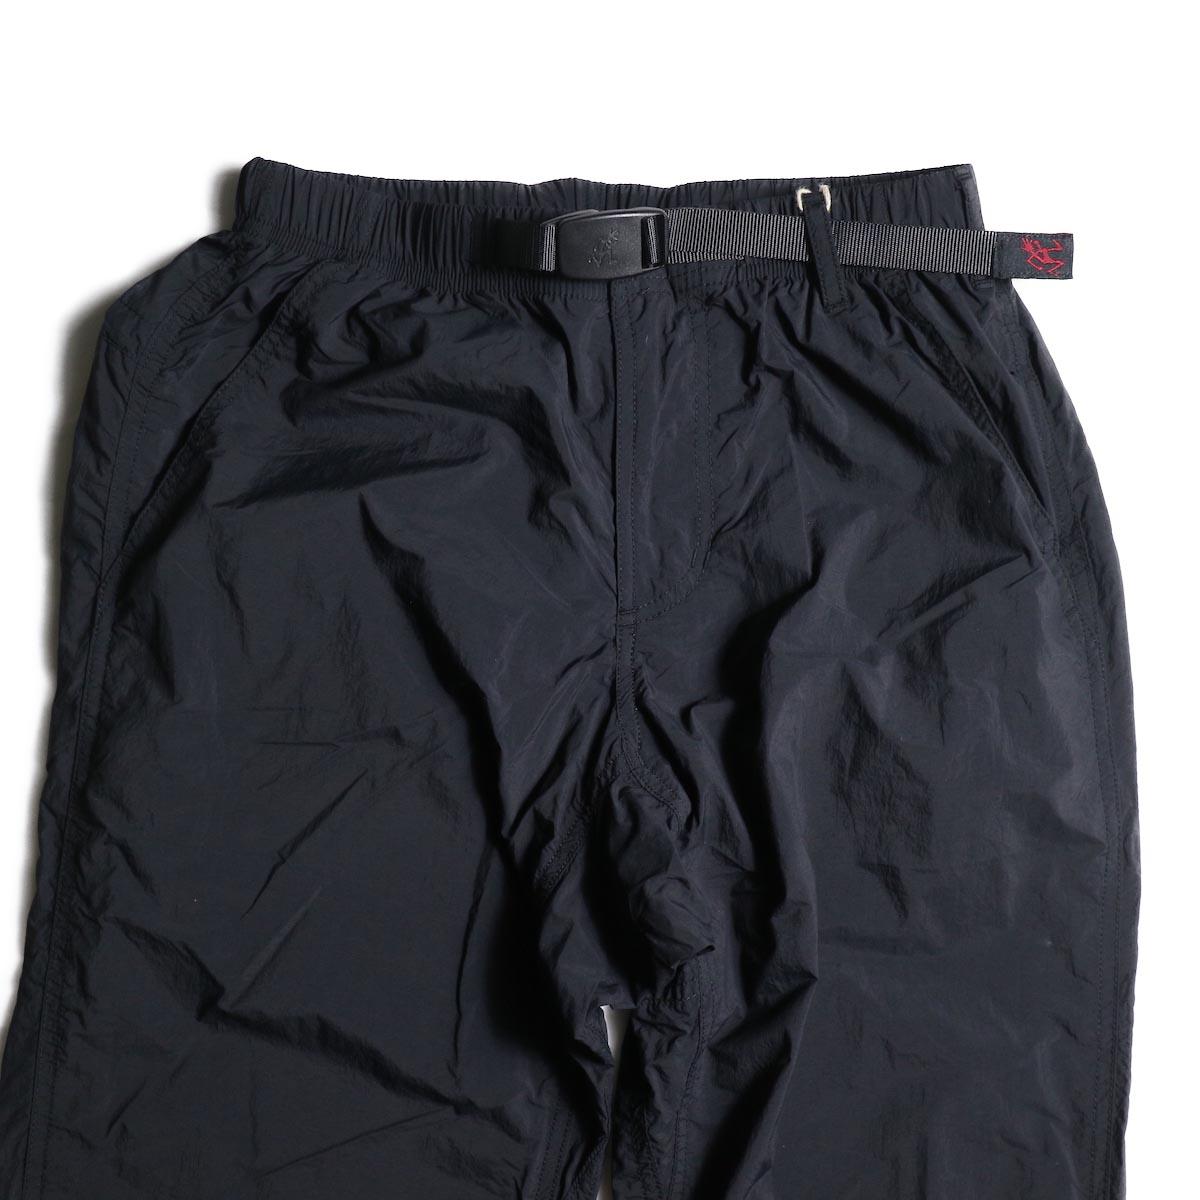 GRAMICCI / Packable Truck Pants (Black) ウエスト